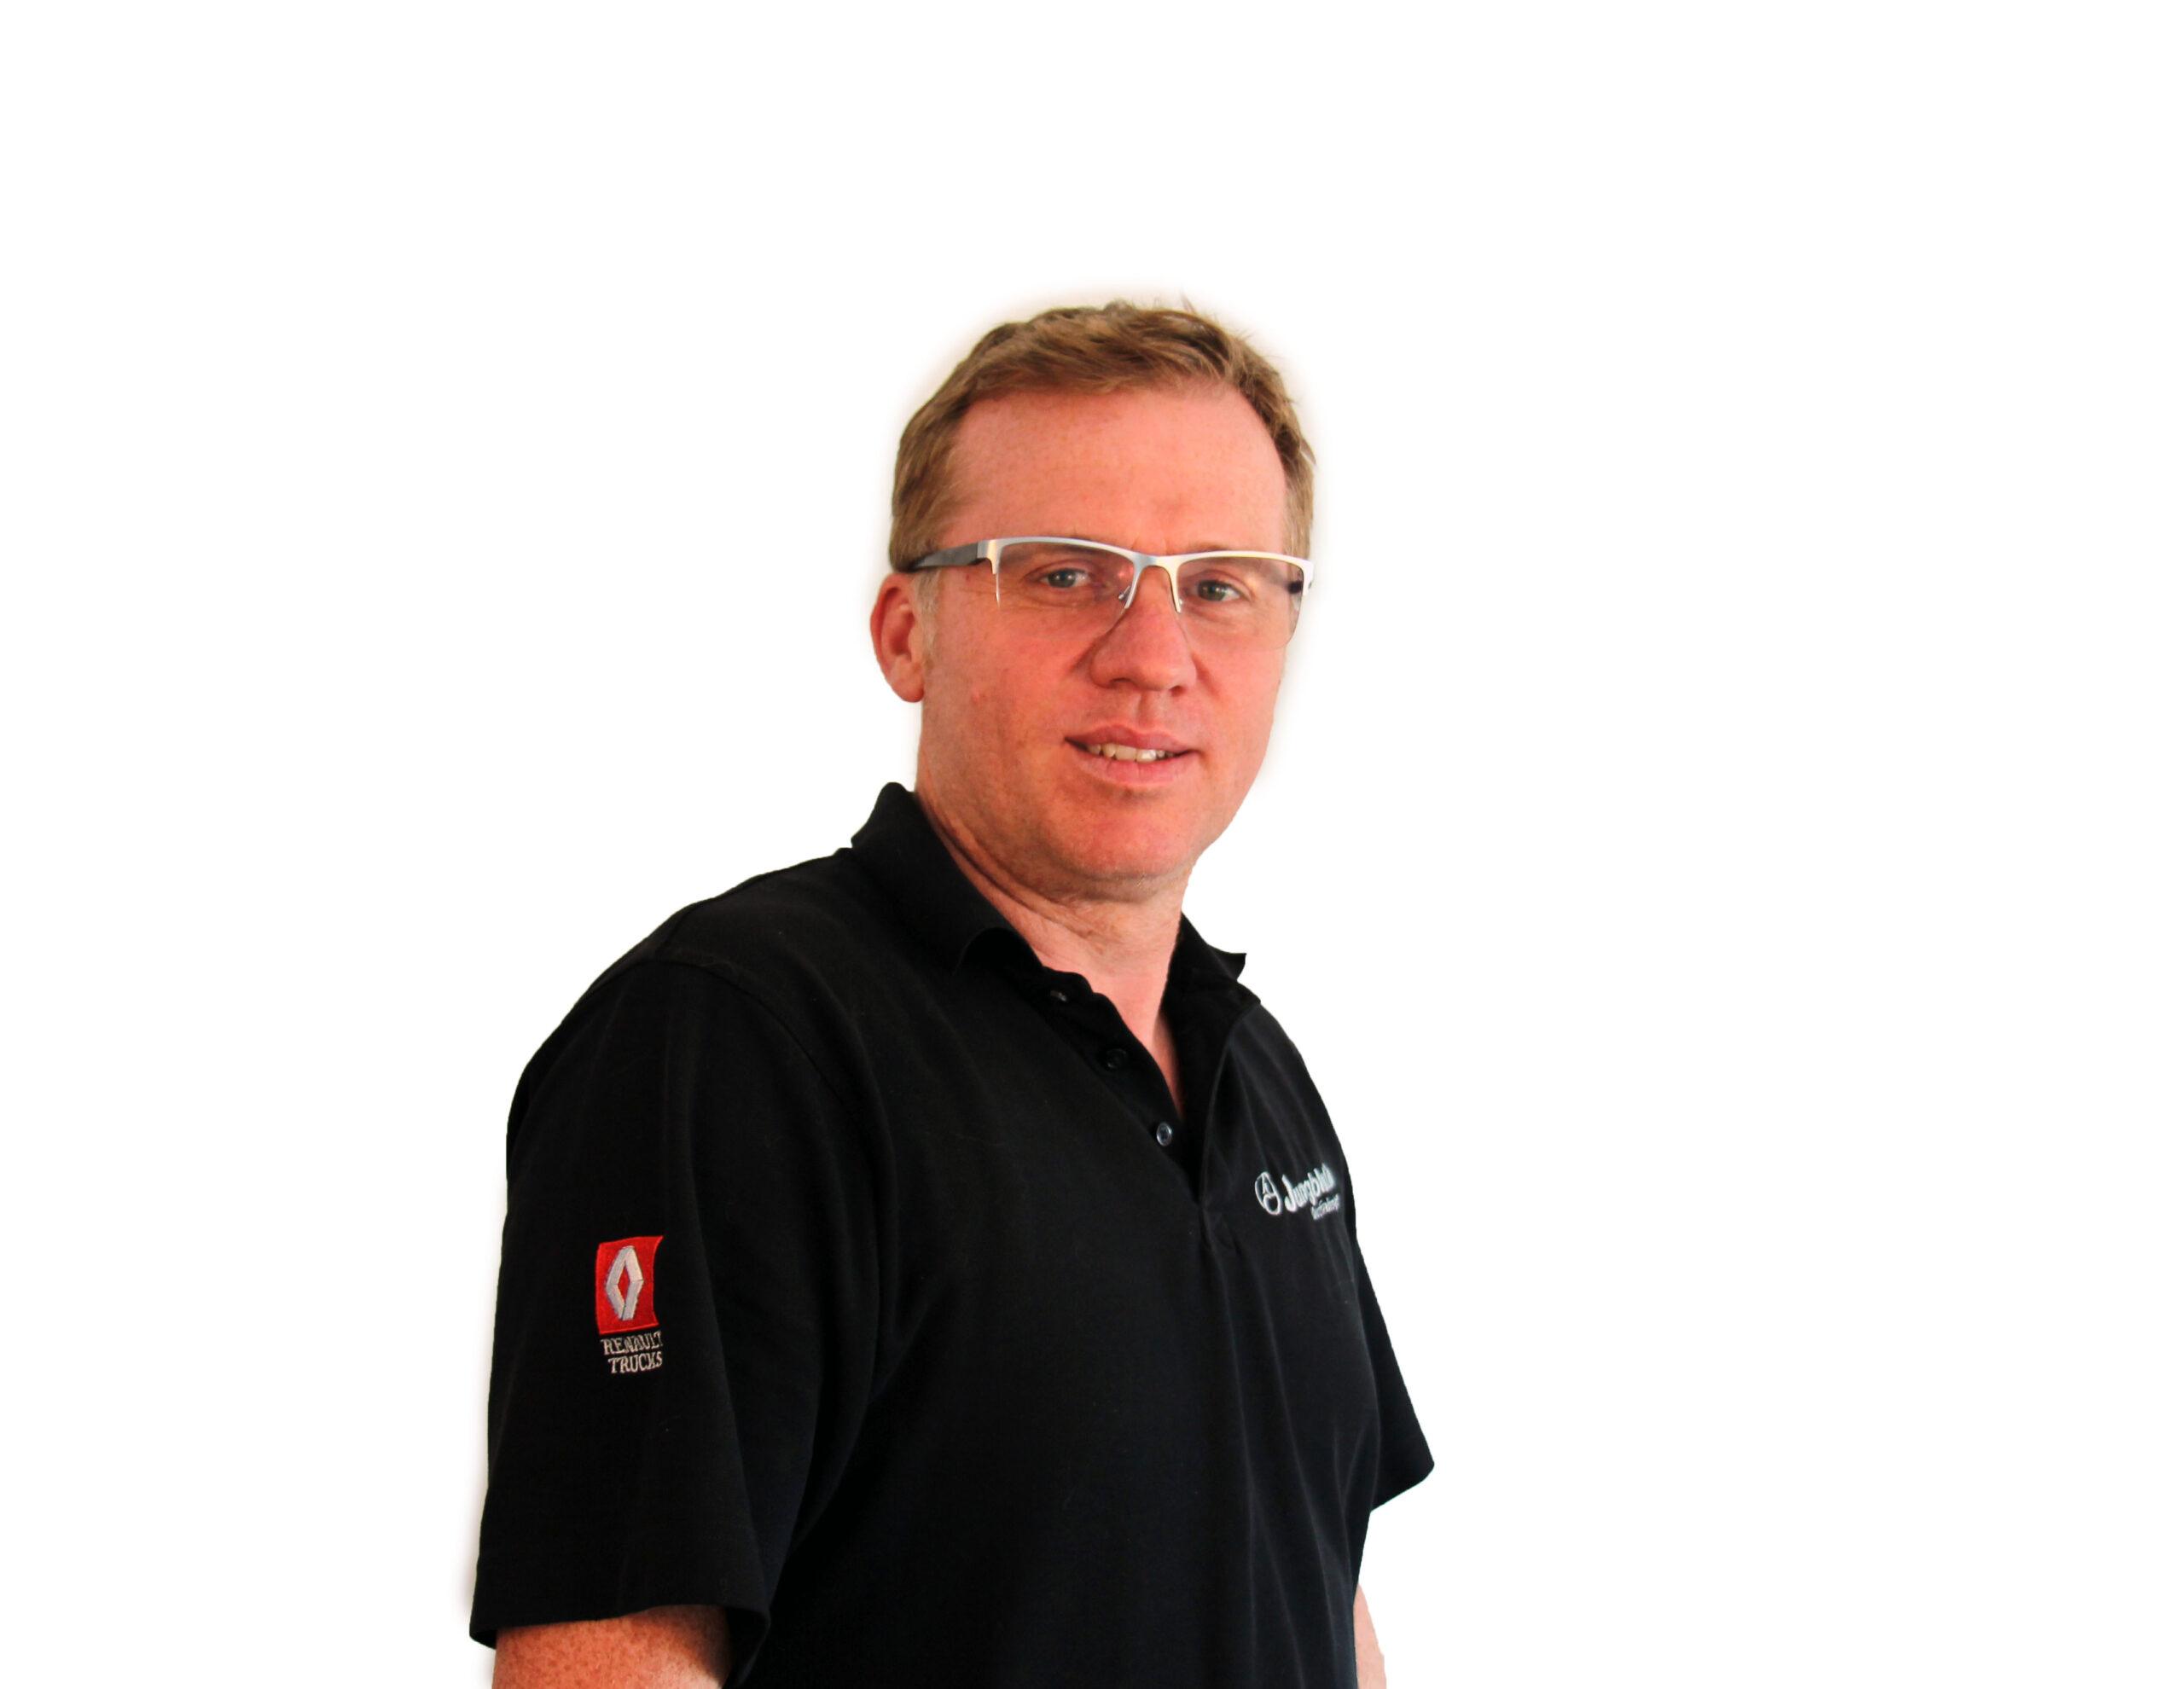 Thorsten Stolzenberger